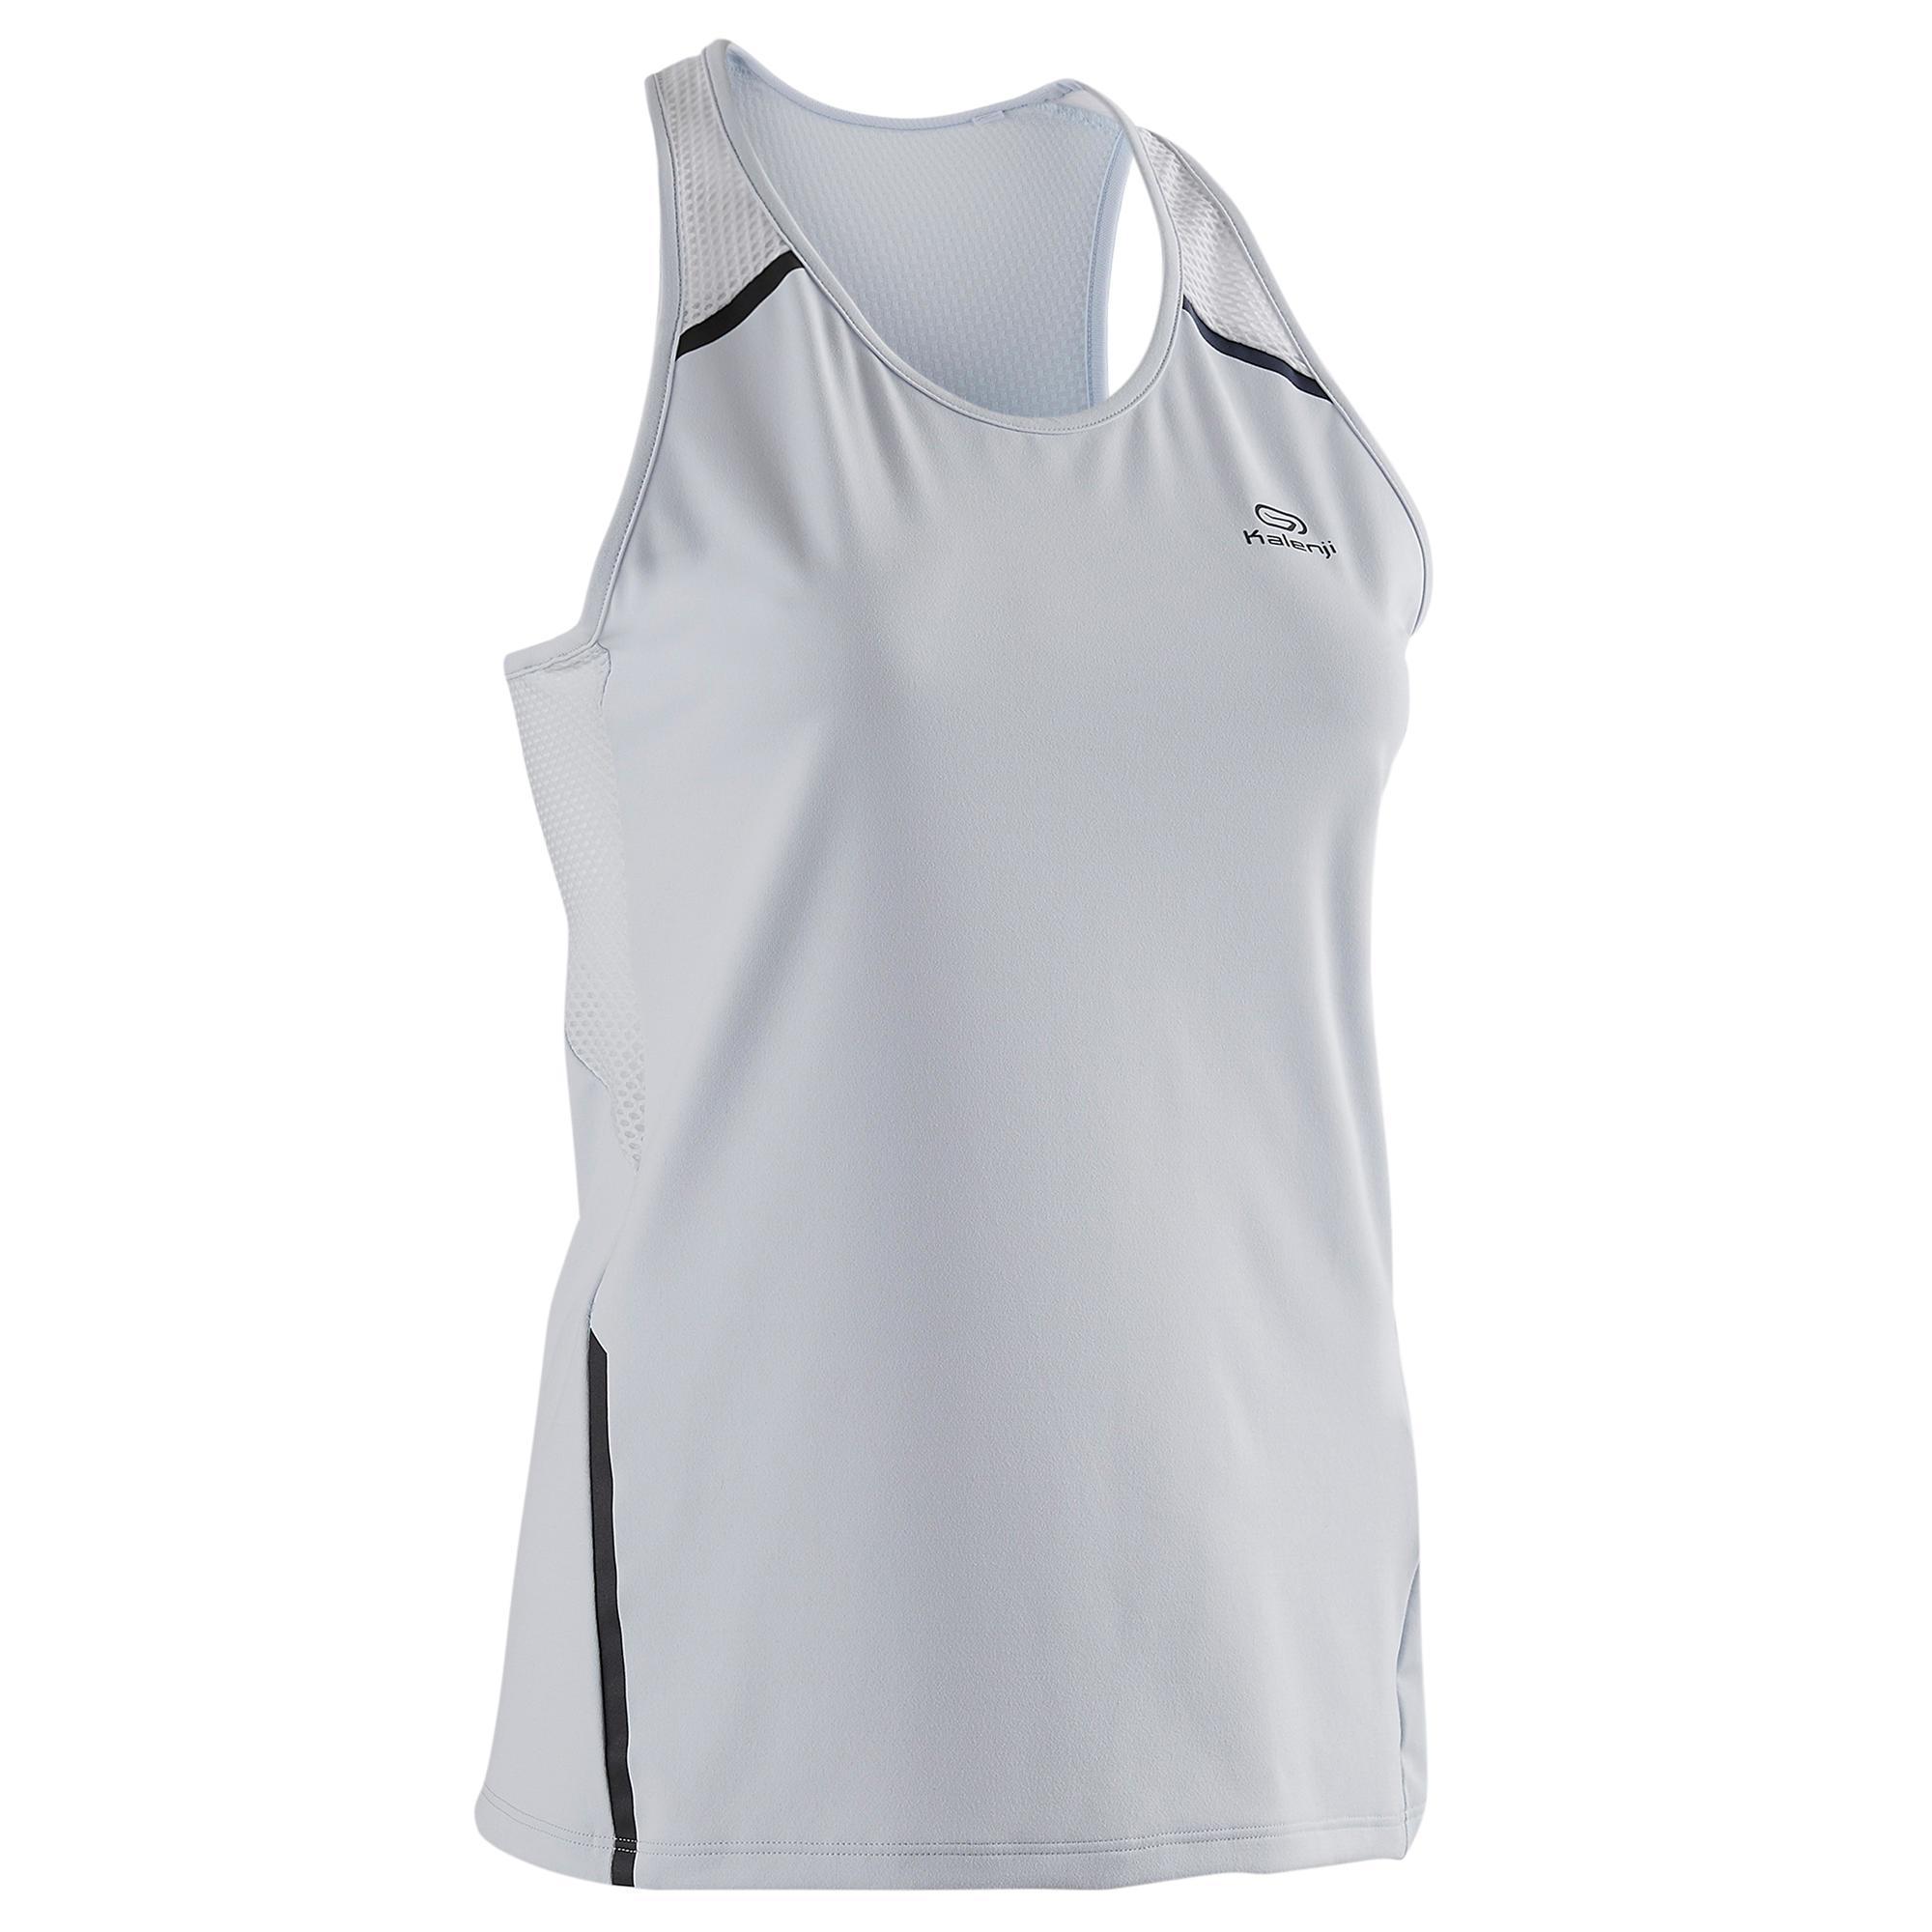 Lauftop Run Dry+ Damen hellgrau   Sportbekleidung > Sporttops > Lauftops   Grau - Blau - Weiß   Ab   Kalenji